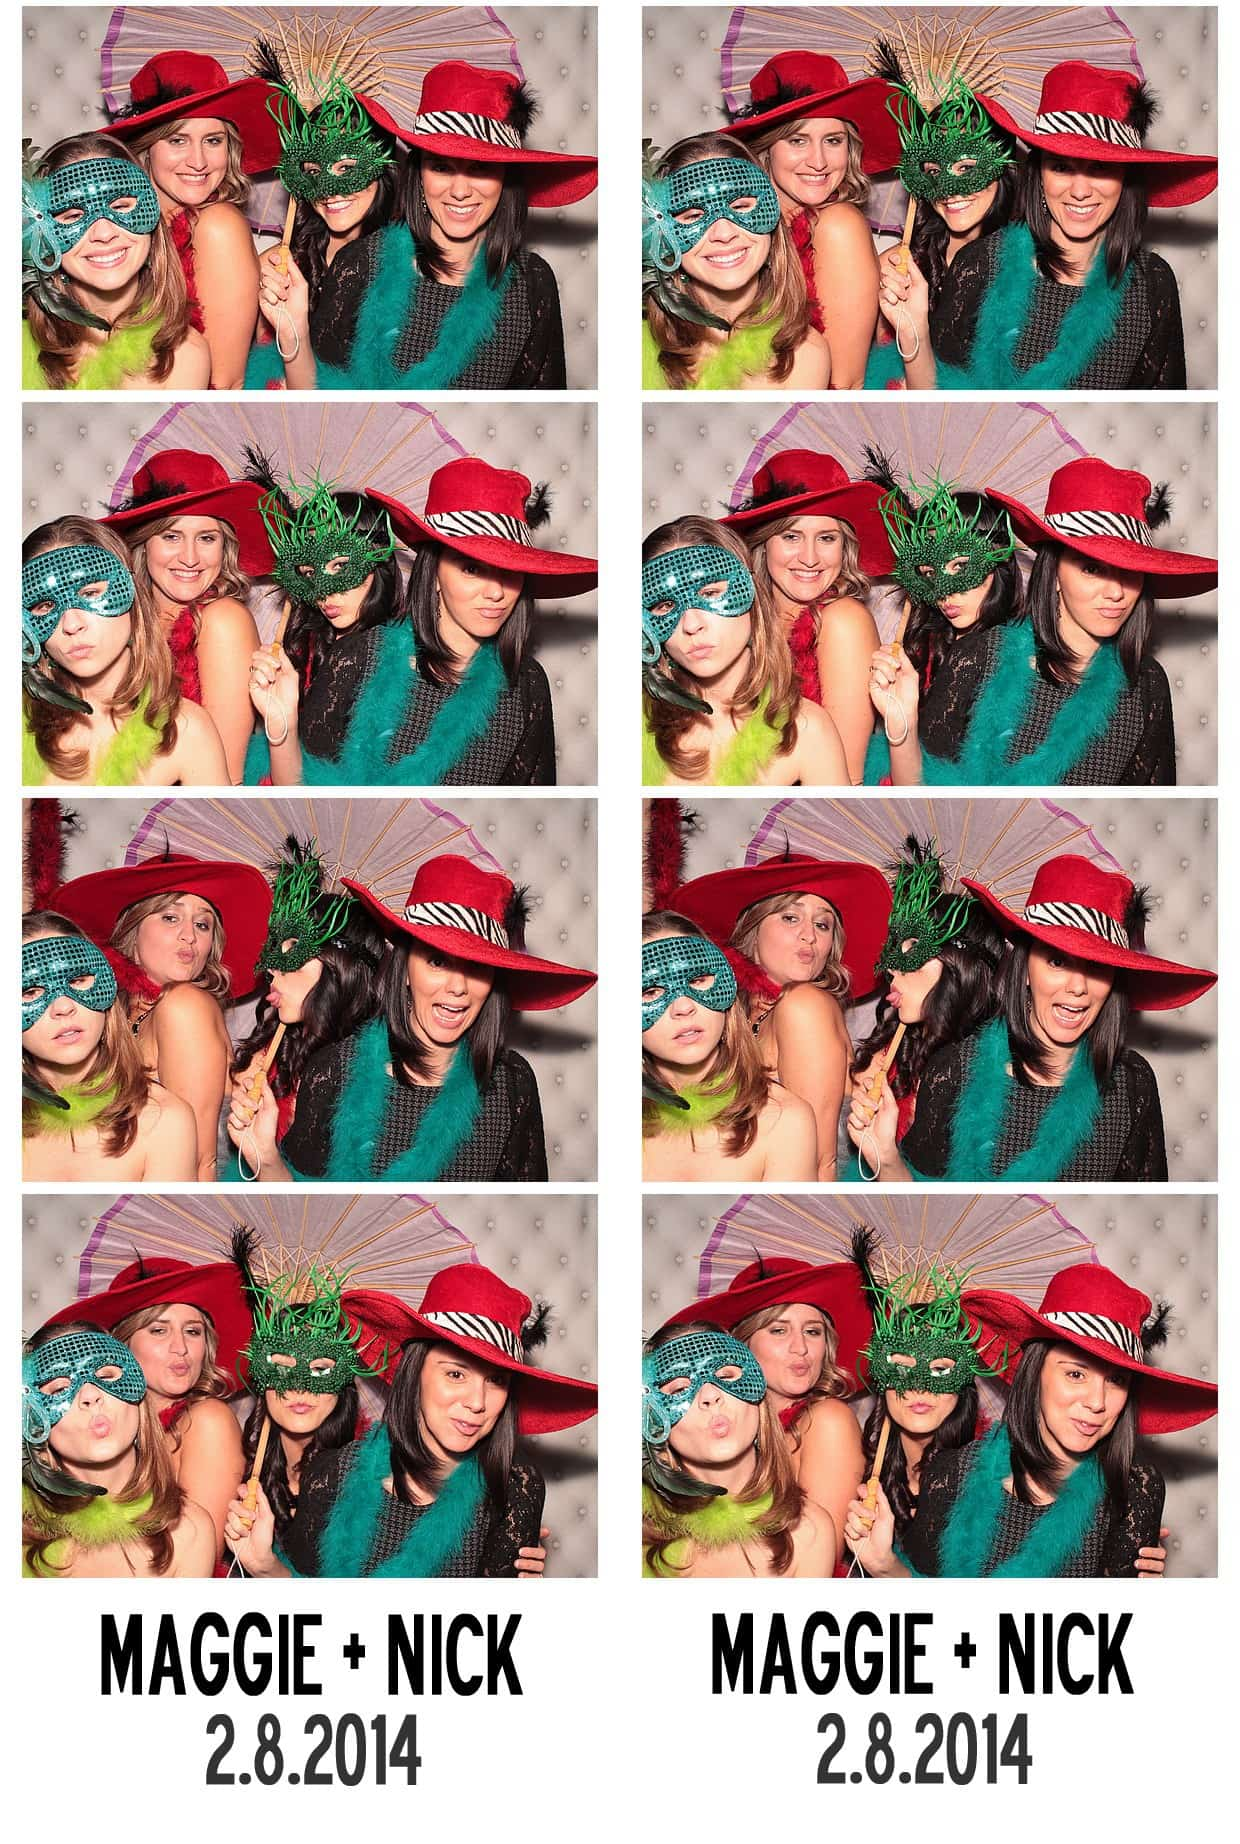 Photobooth-Rental-Austin-San Antonio-Gala-Dance-Wedding-Reception-Party-No. 1-Props-Photography-LGBT-Fun-Best